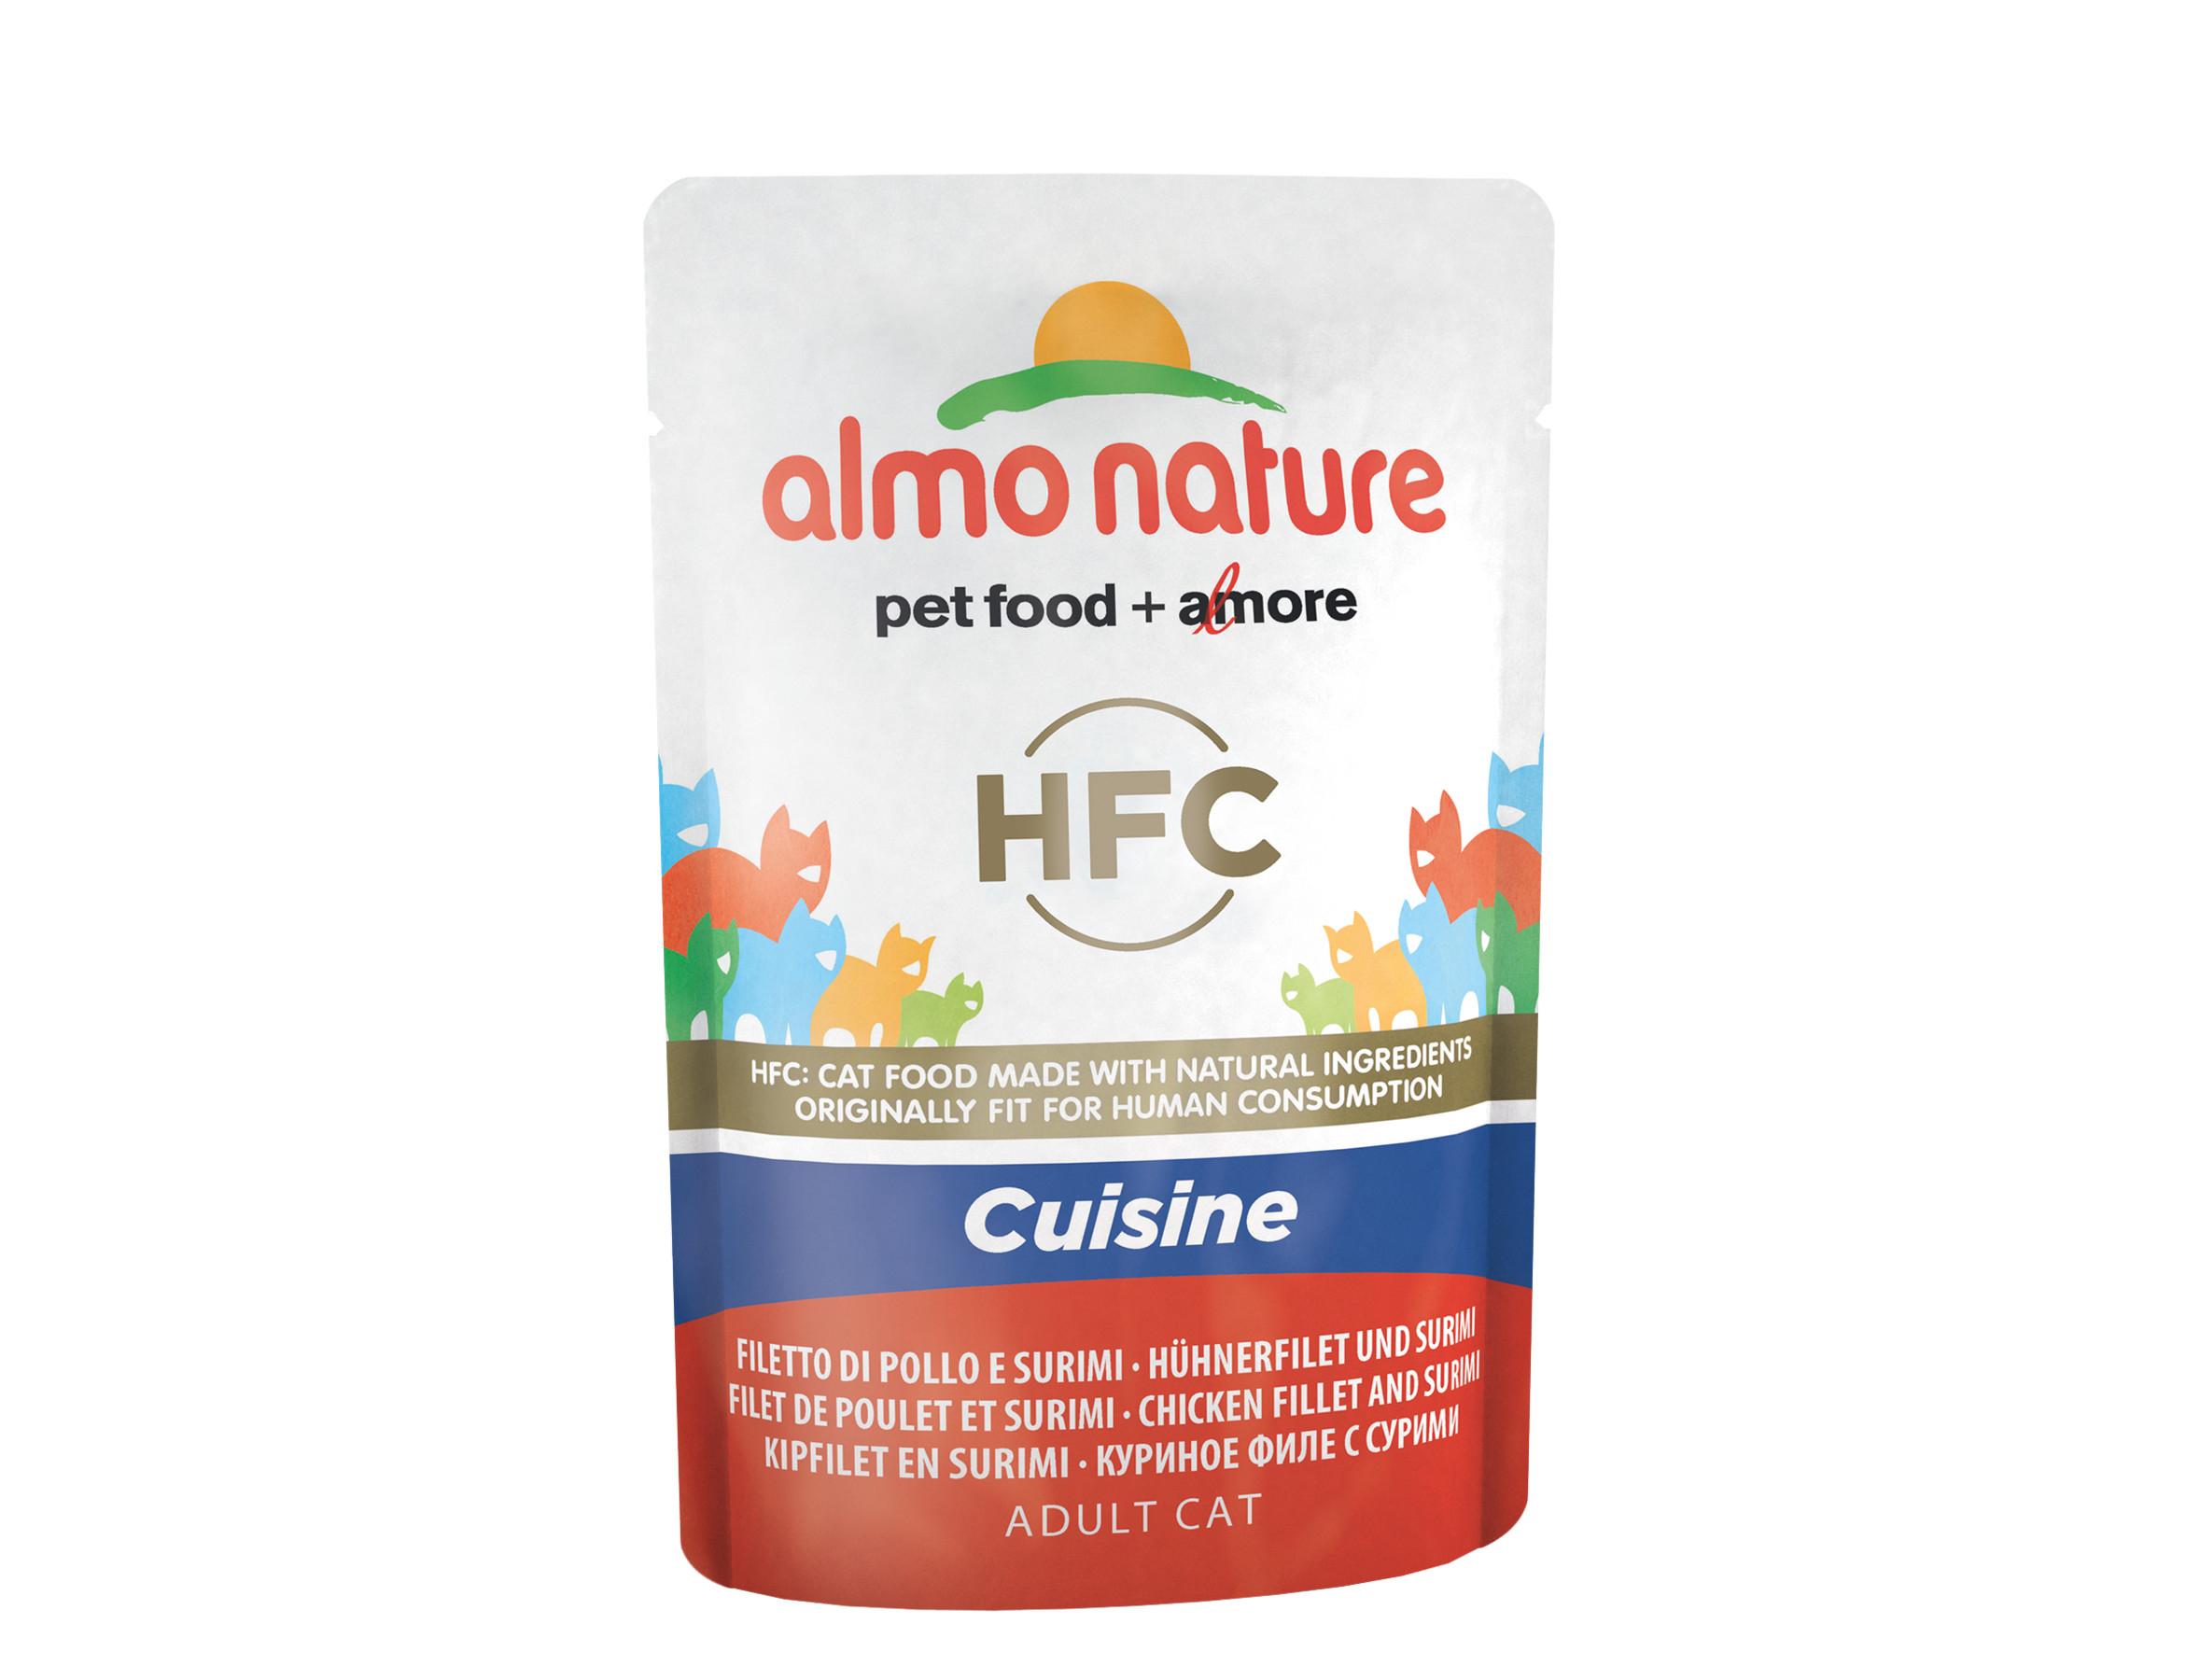 Almo Nature Cat Wet Food Cat Hfc Cats Cuisine Chicken Surimi